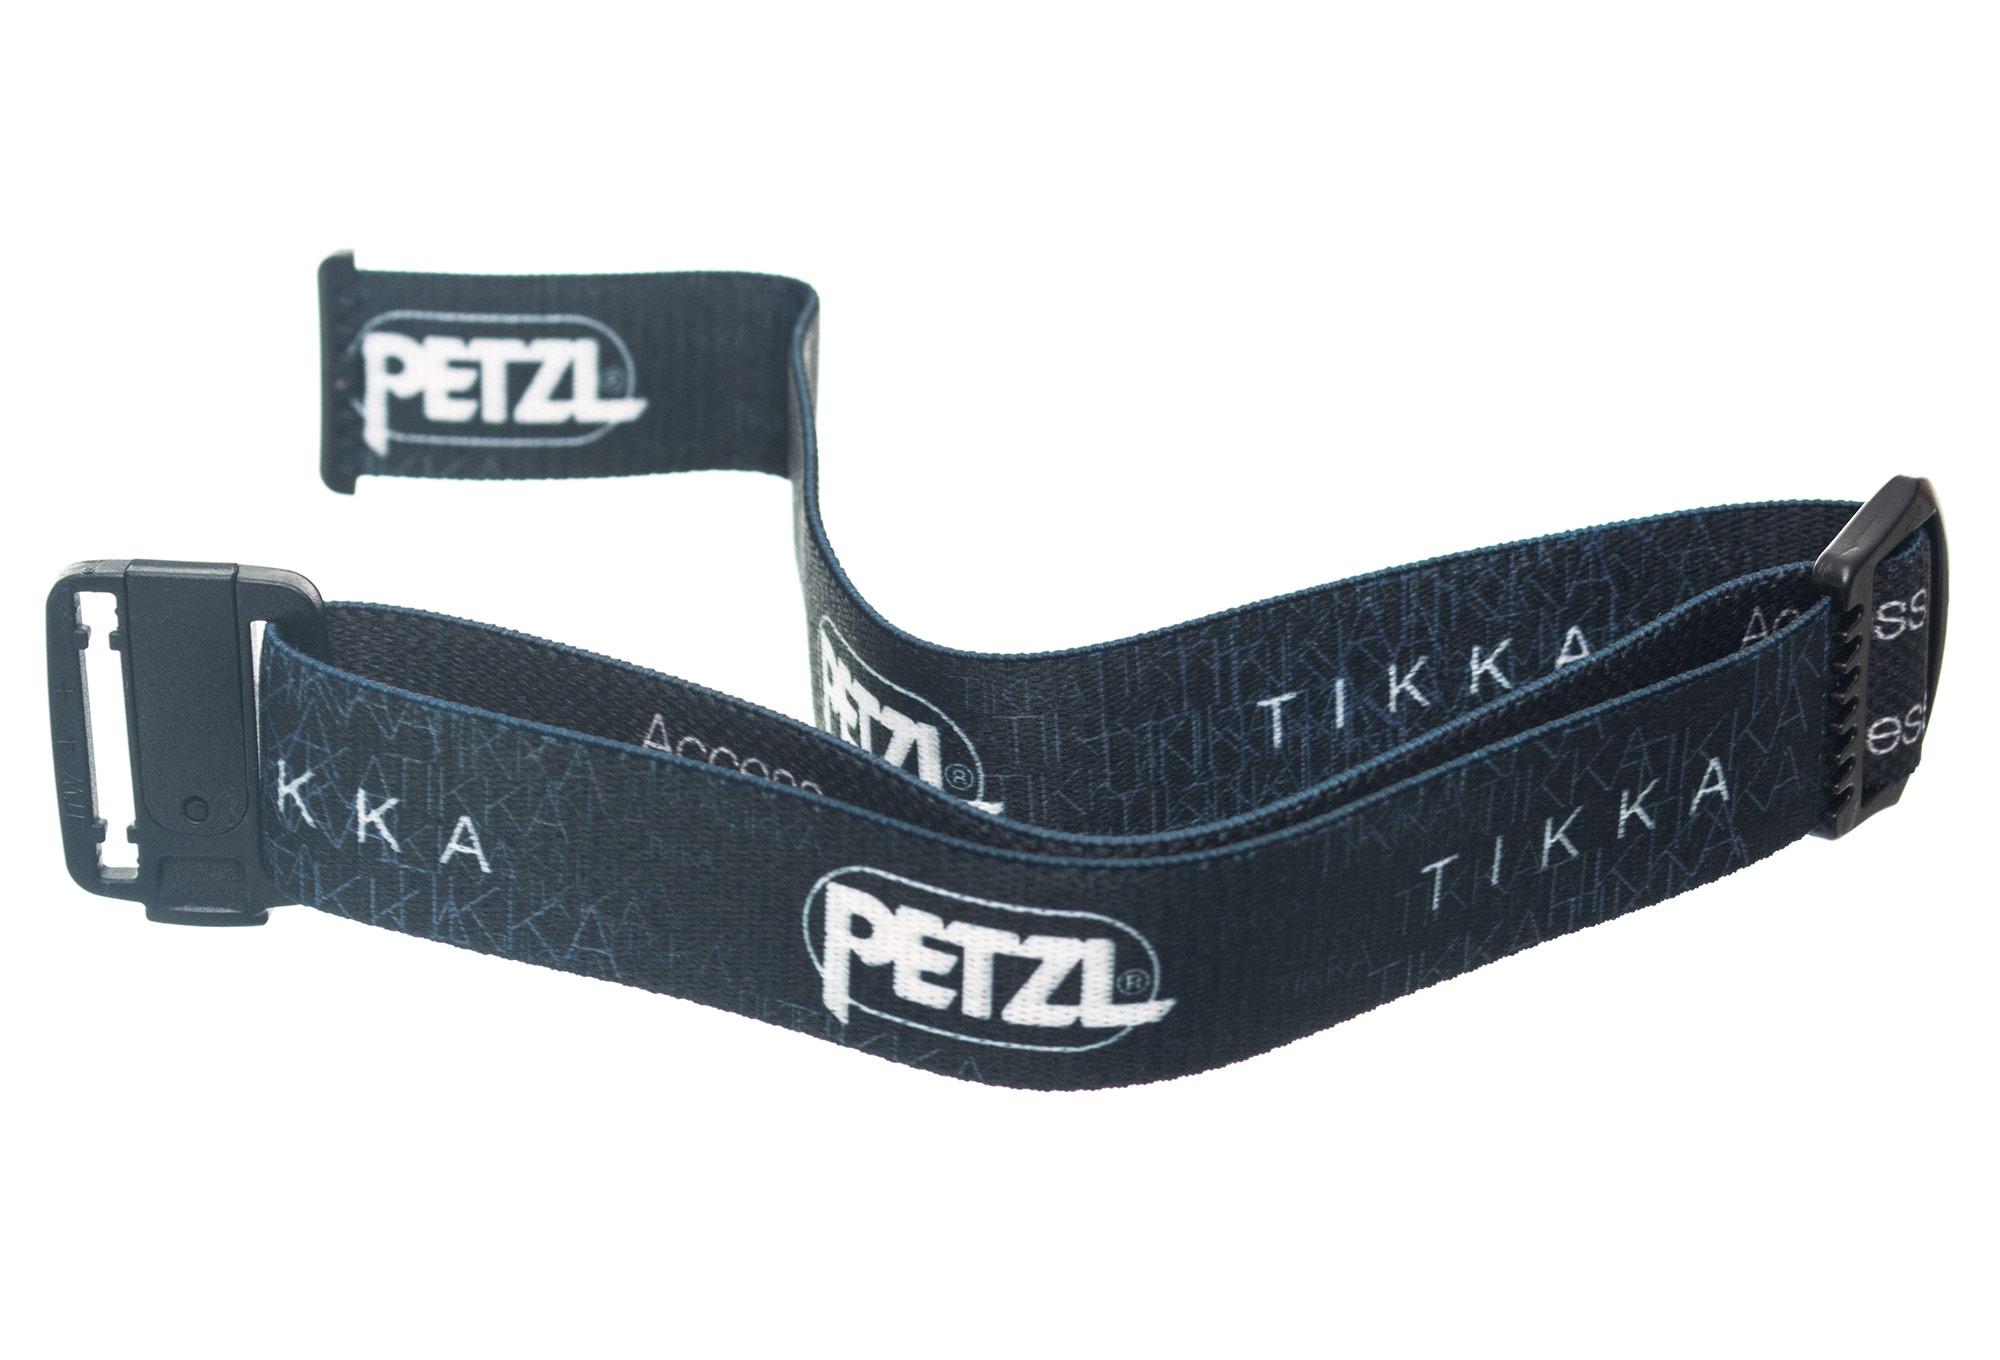 Lampe Frontale Petzl Tikkina